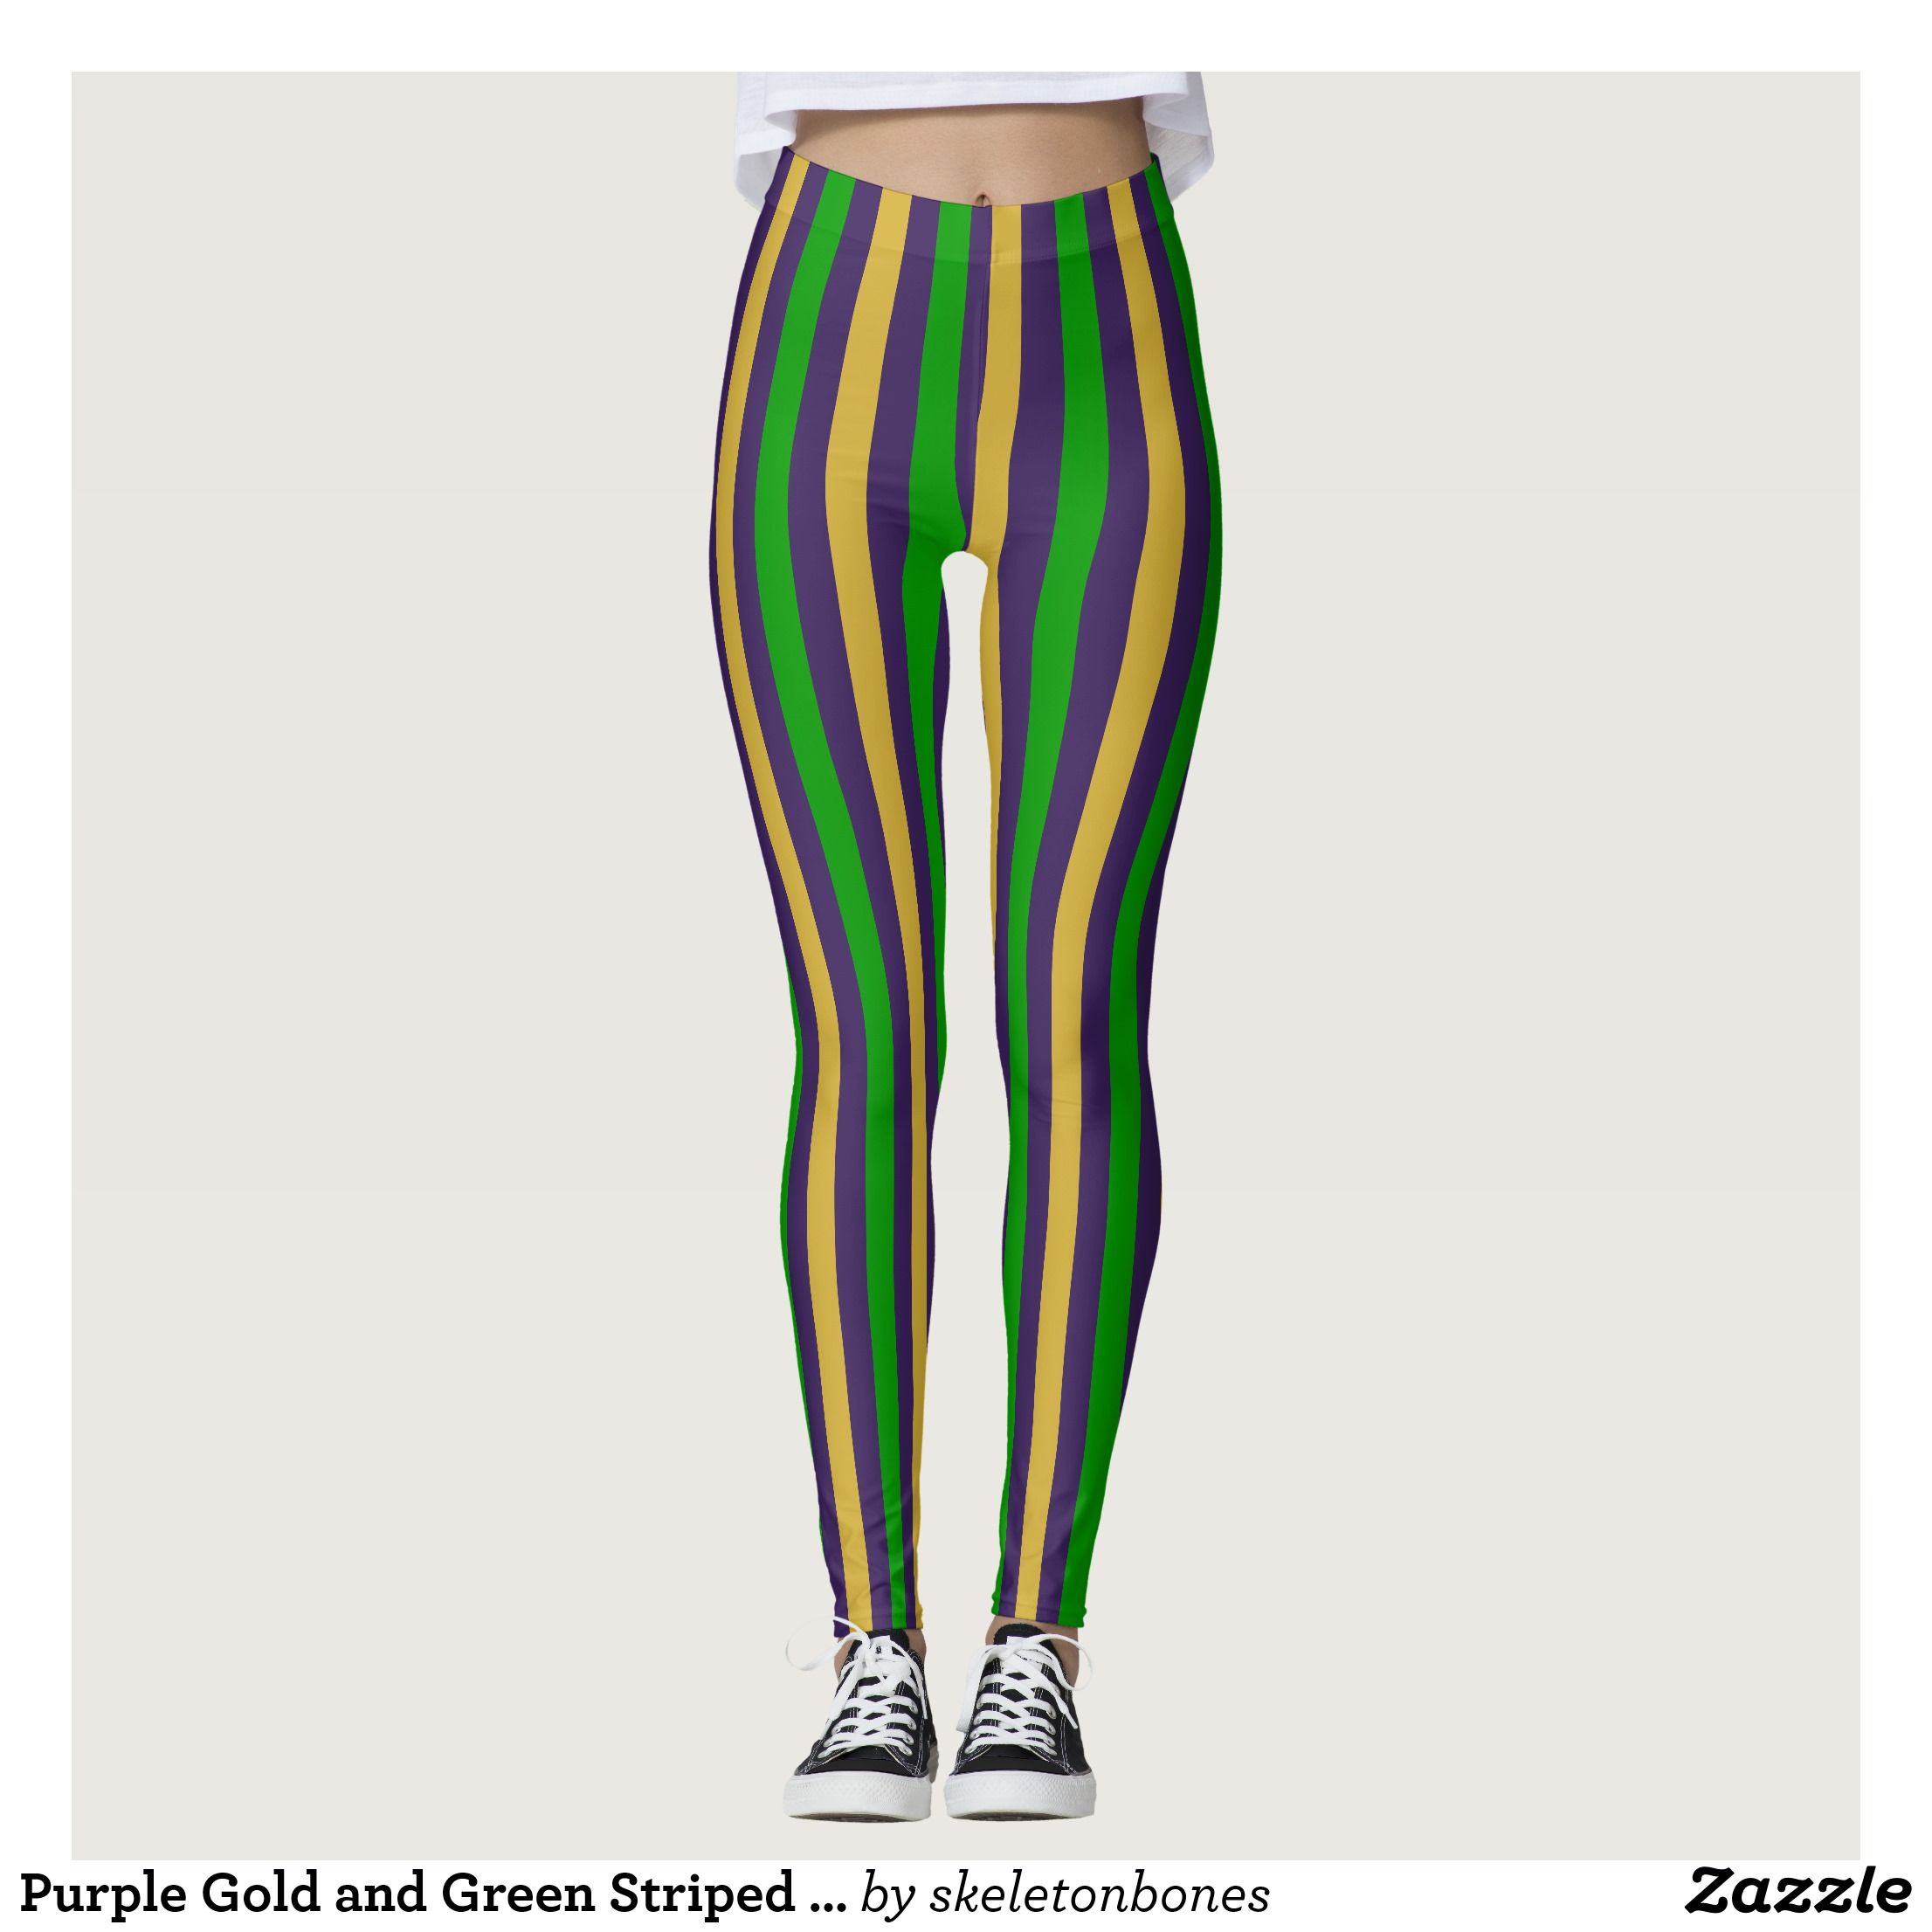 Purple Gold and Green Striped Mardi Gras Leggings